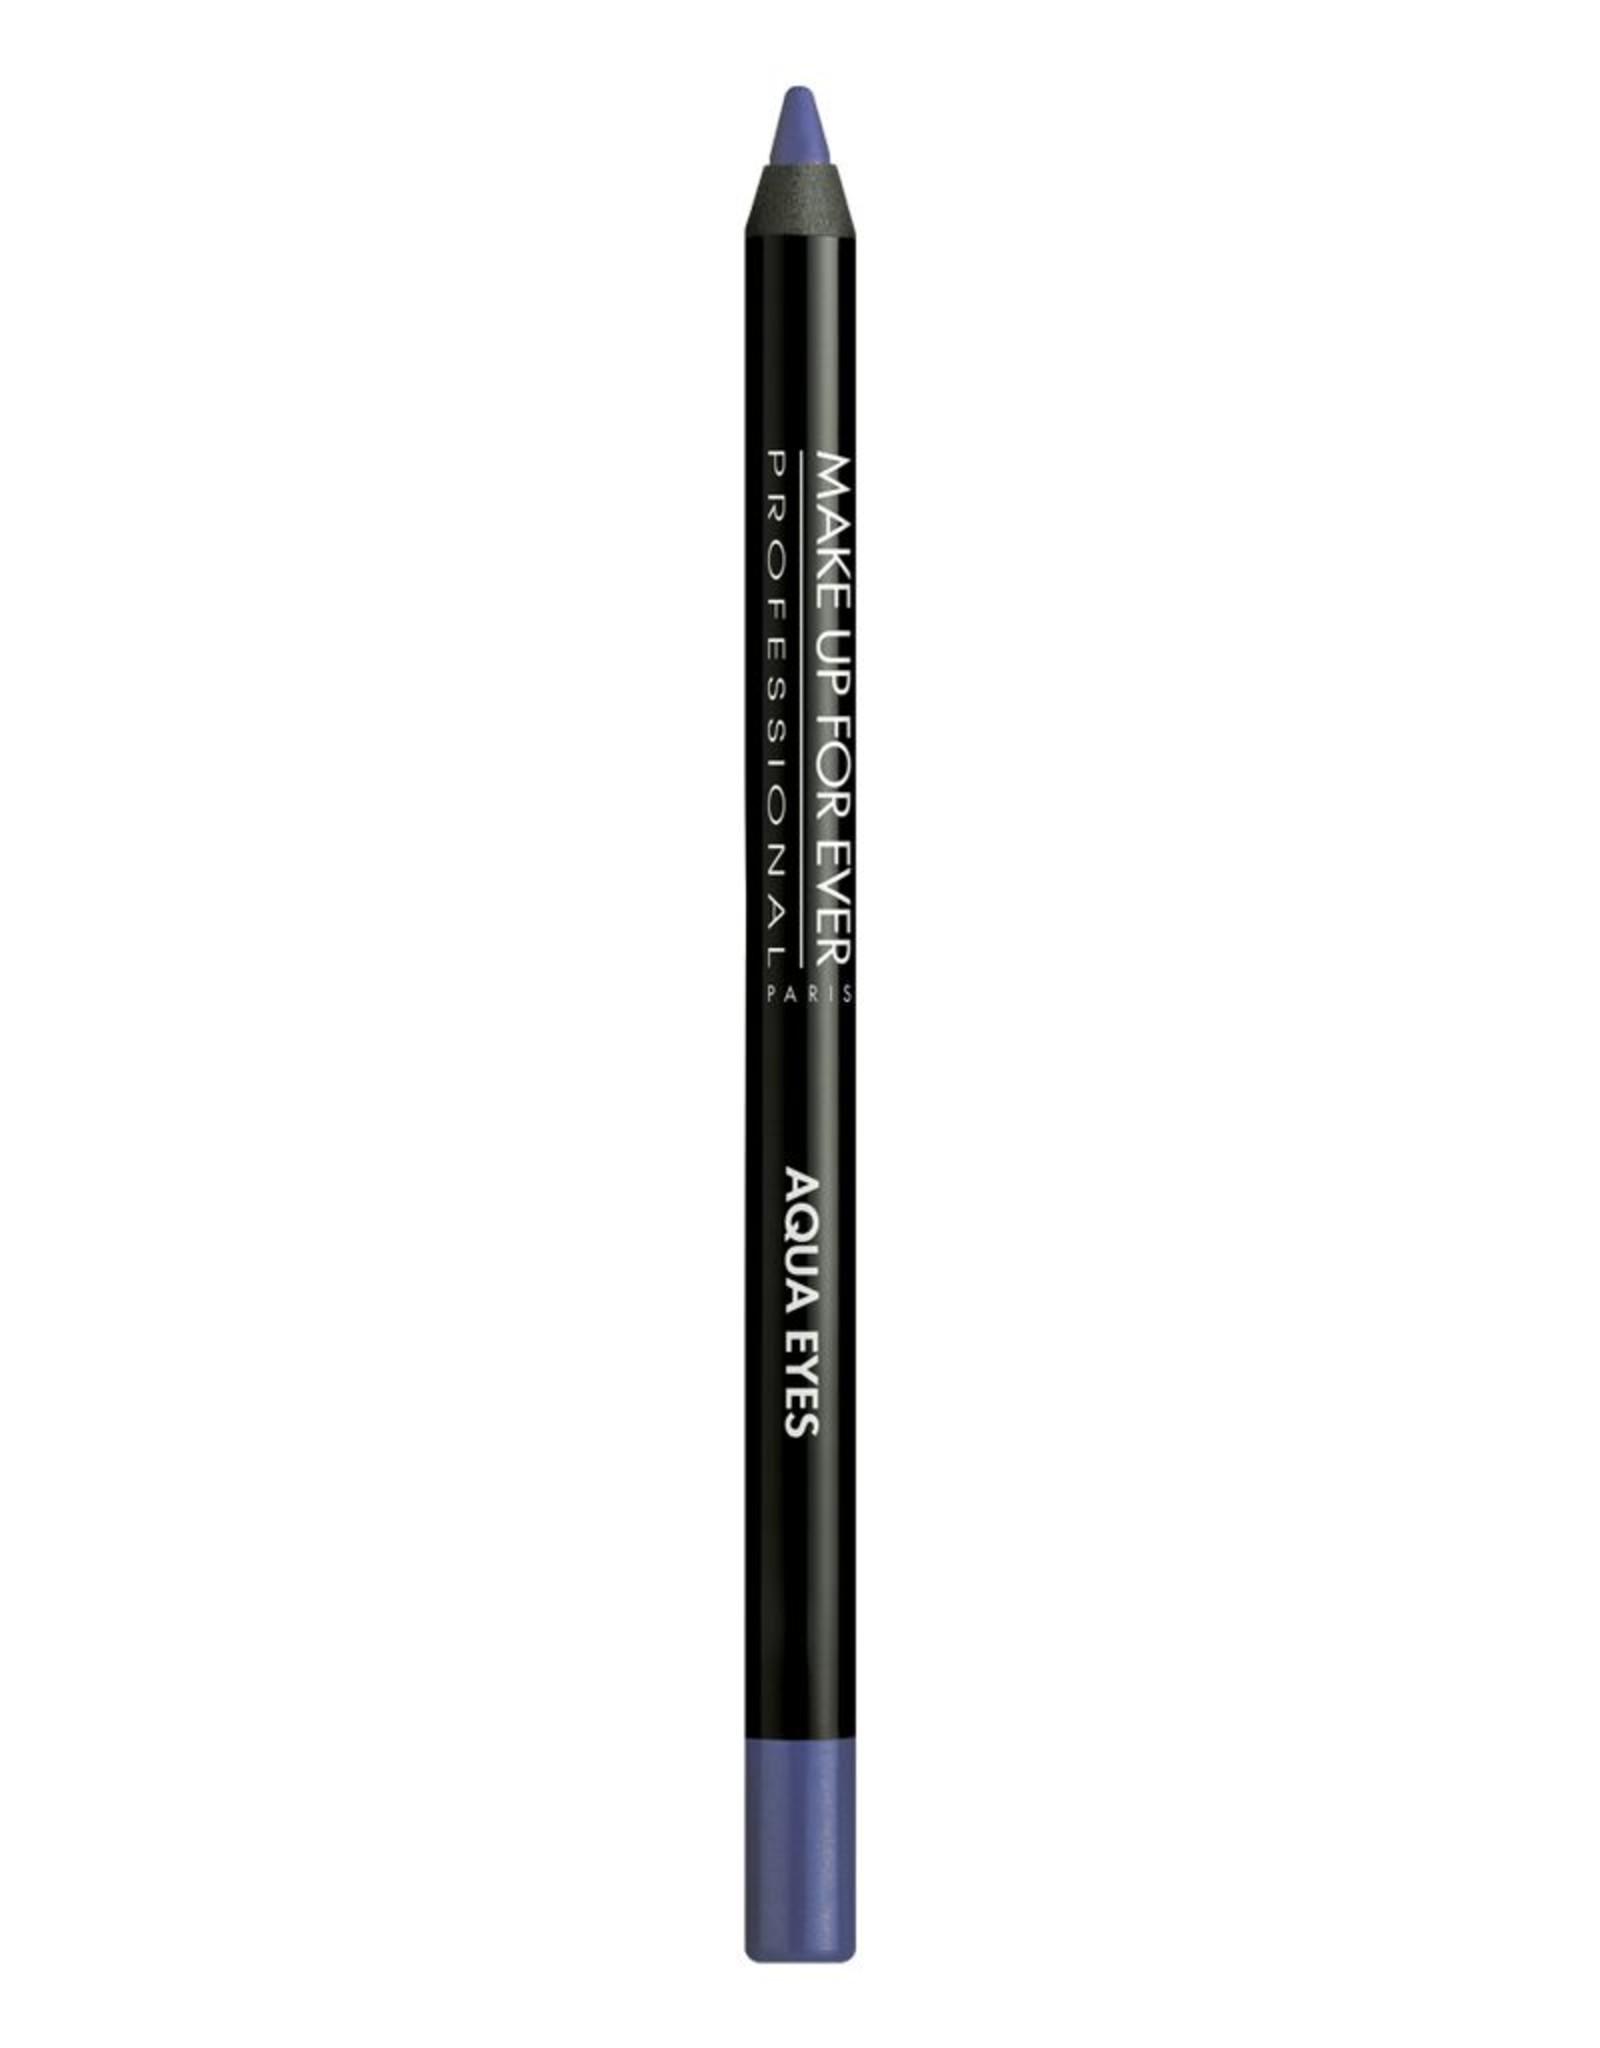 MUFE AQUA EYES CRAYON YEUX WTP NACRE 1,2g 3L bleu marine irise / iridescent navy blue